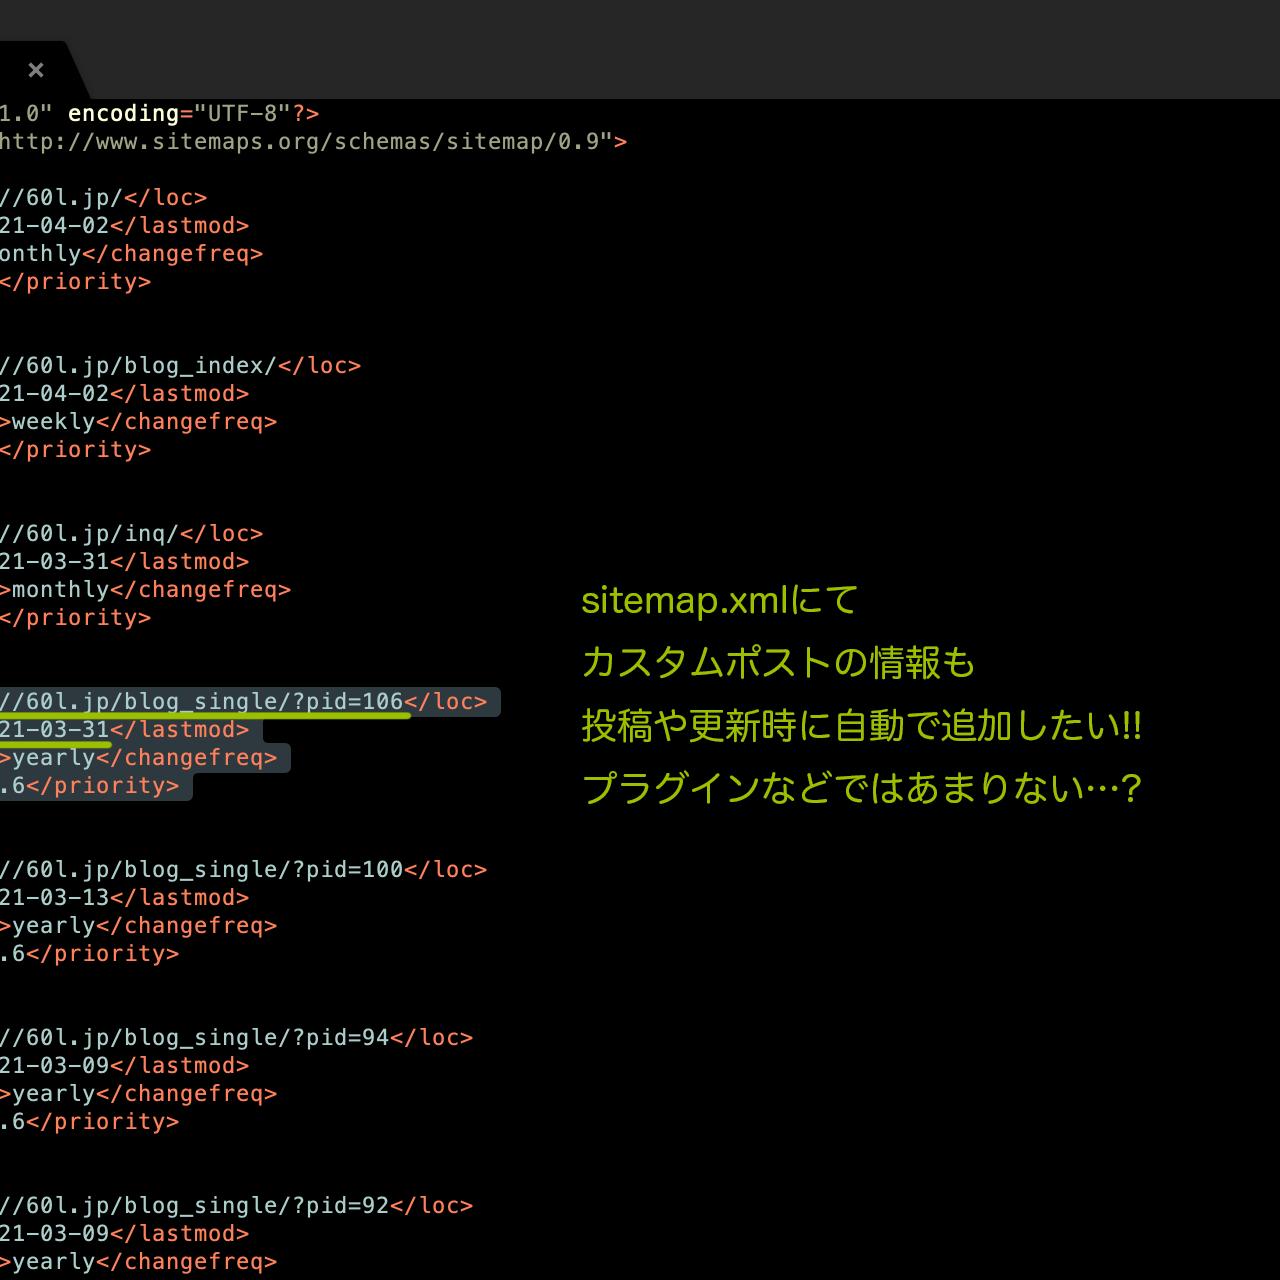 sitemap.xmlをカスタムポストの投稿更新で自動で更新する